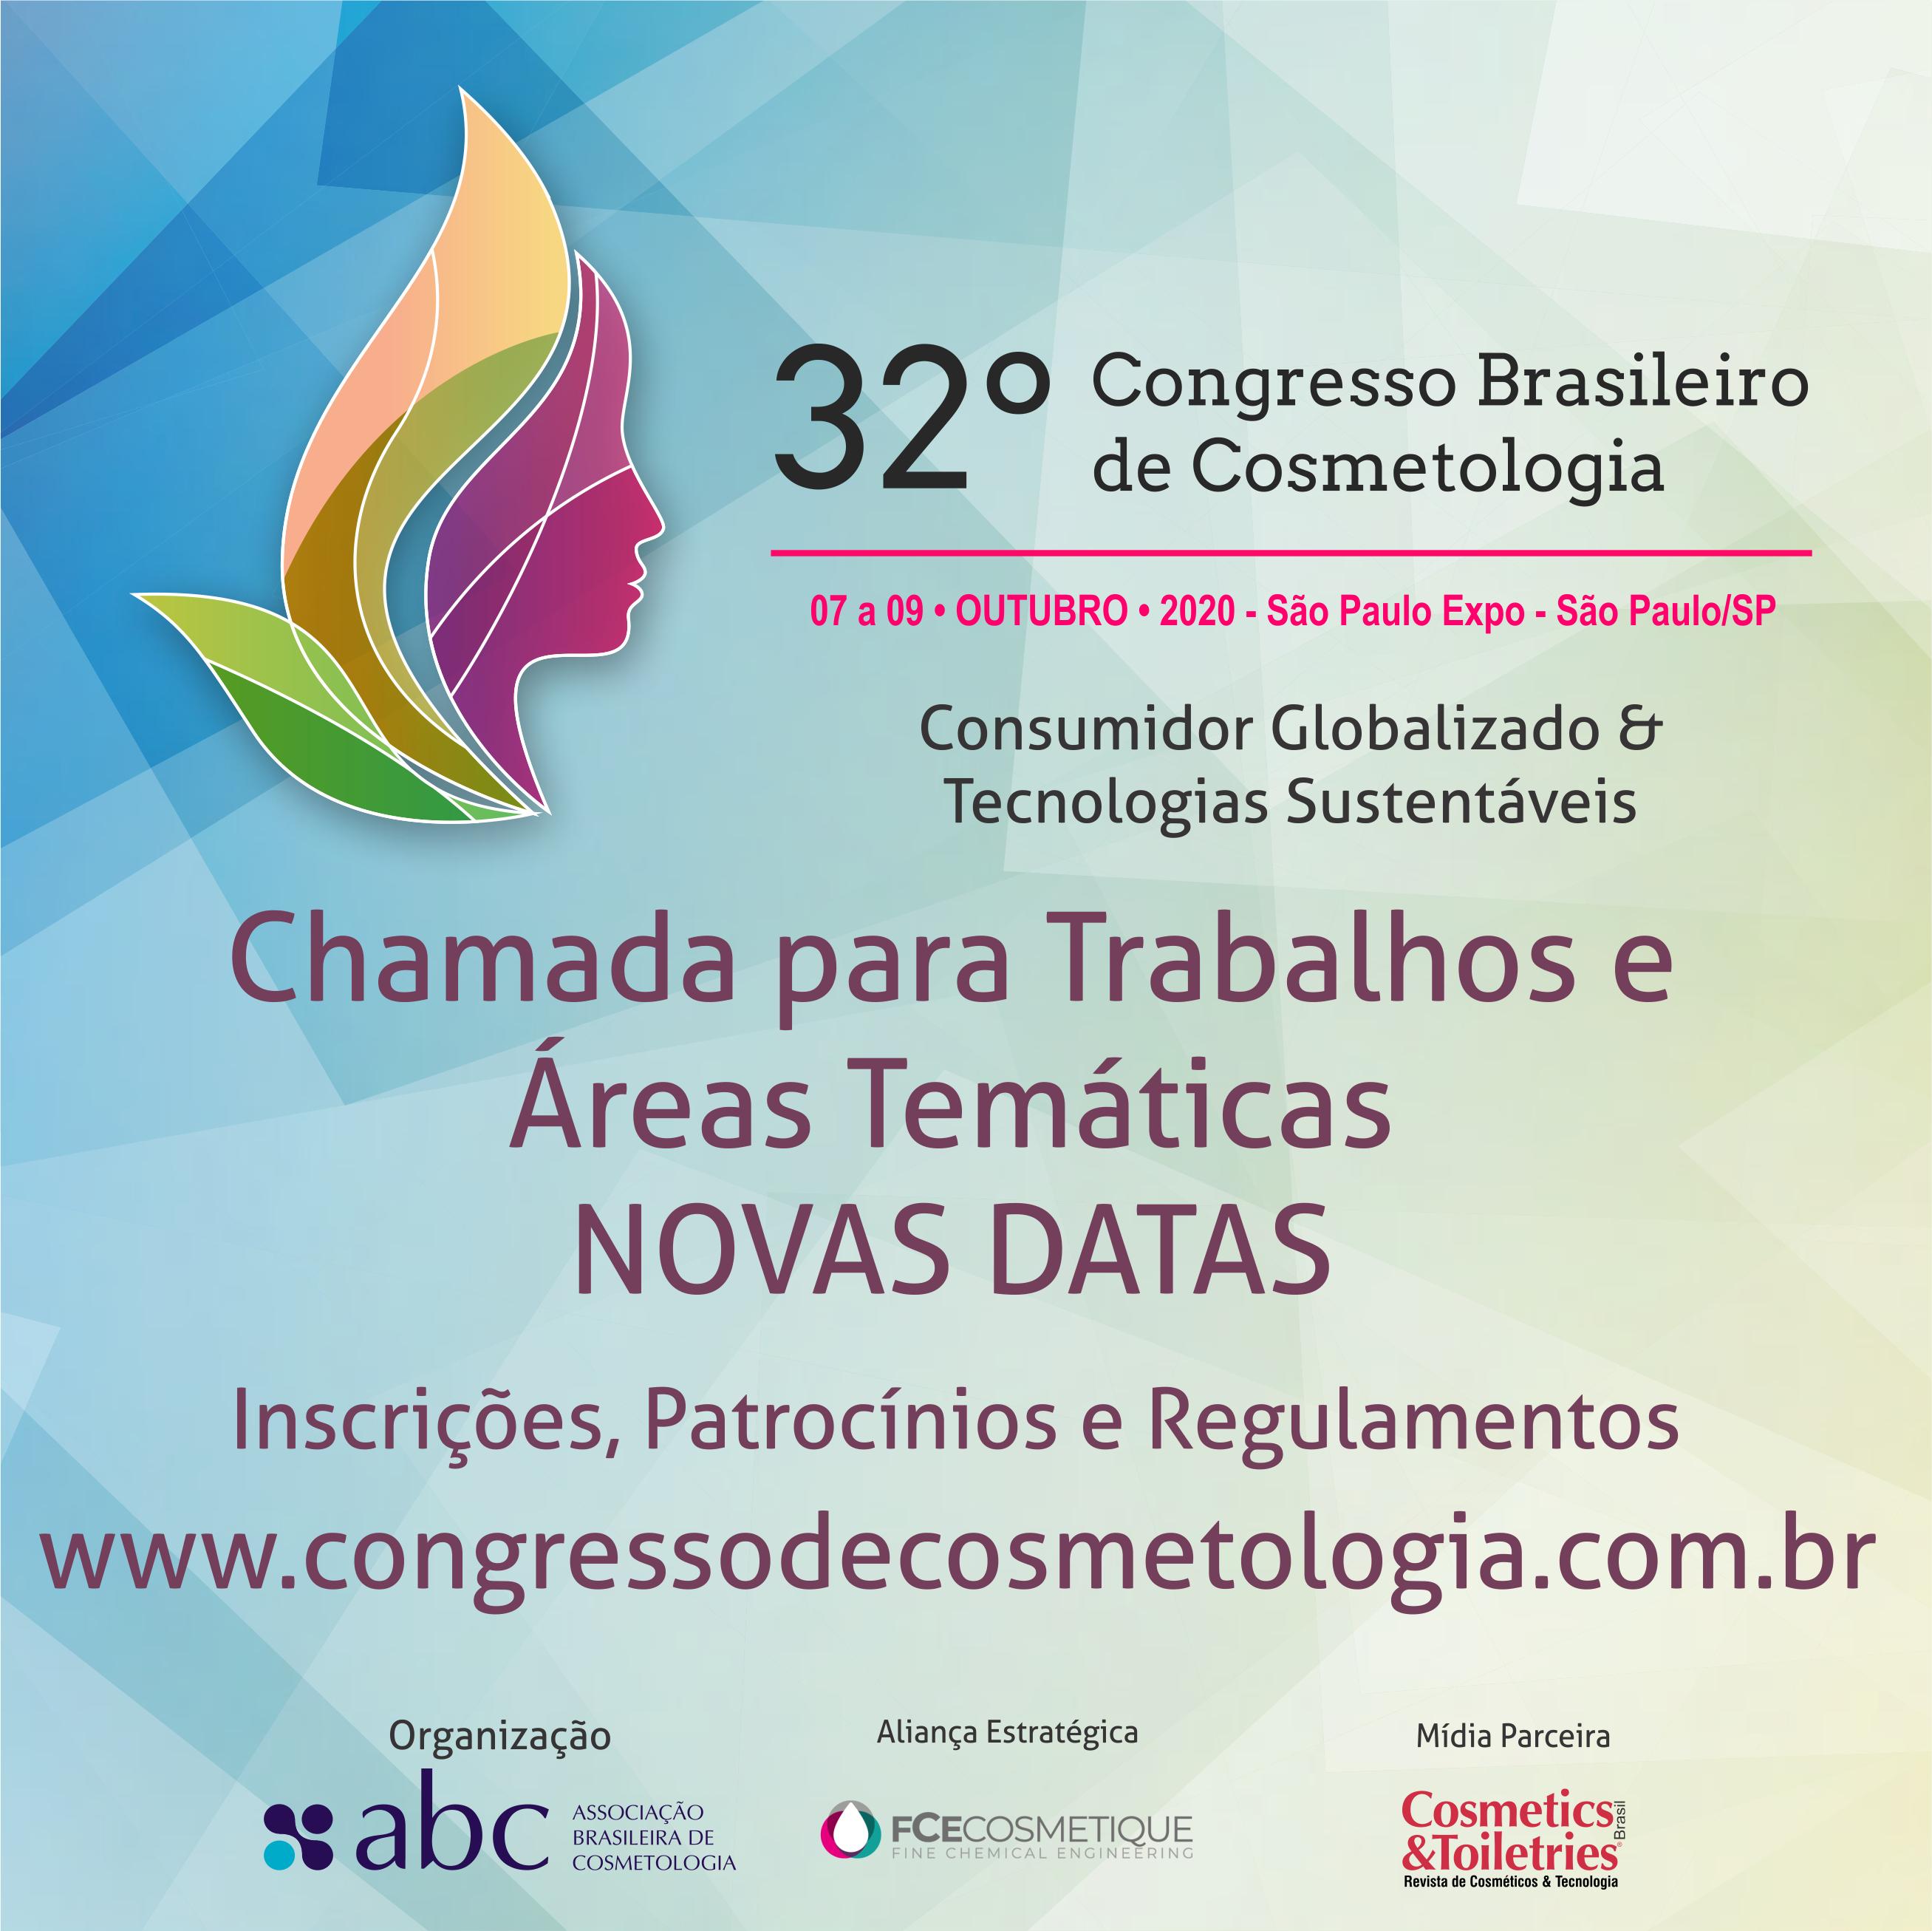 https://www.cosmetologiabrasil.com/congresso2020